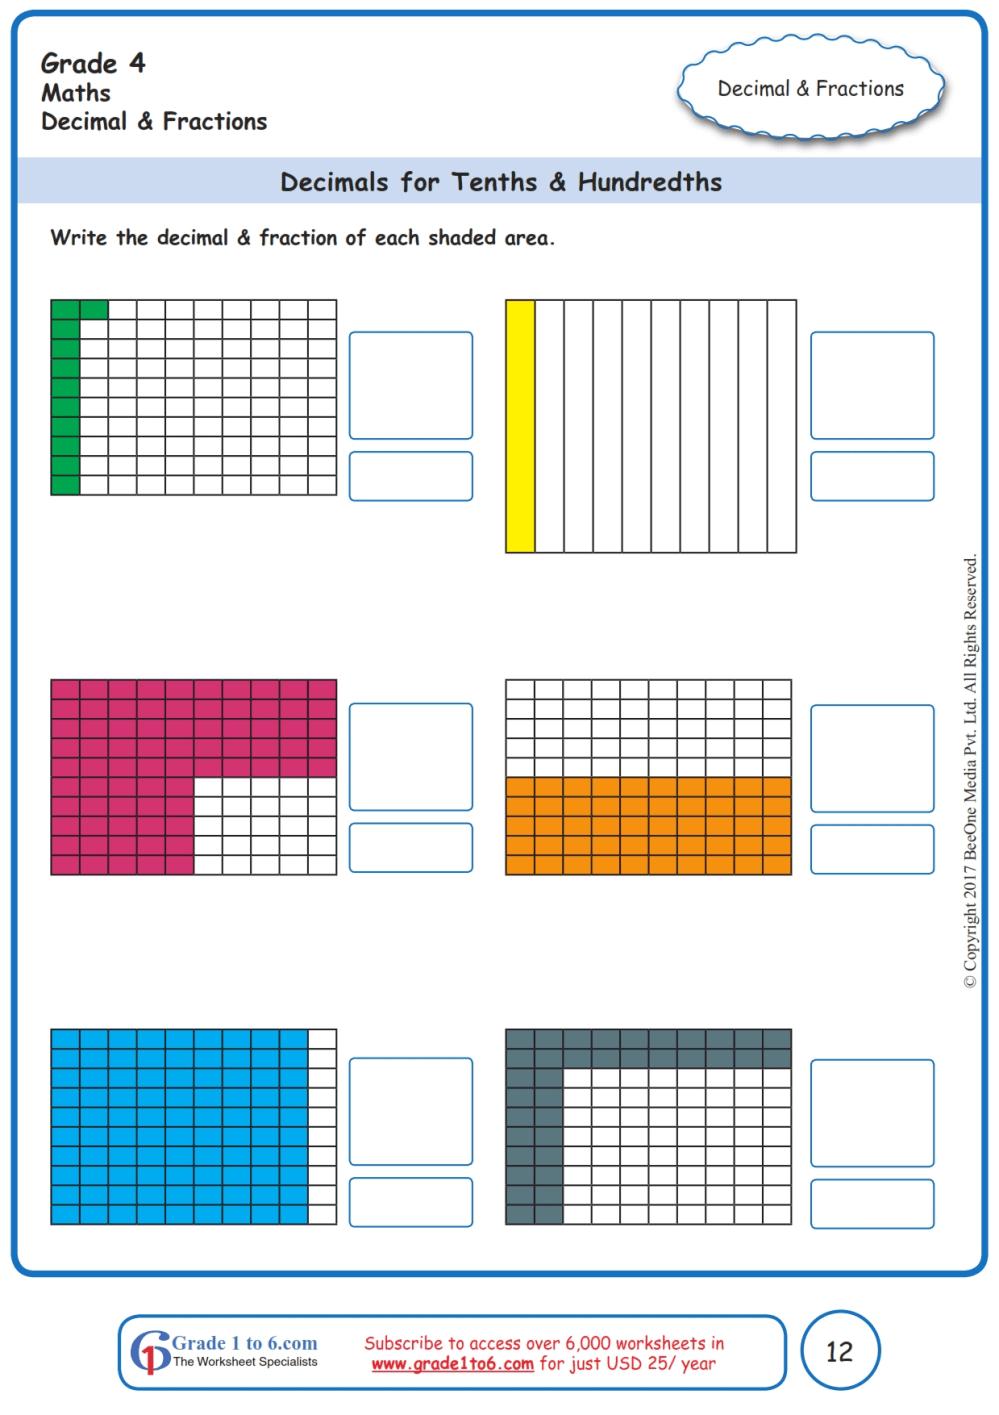 medium resolution of Grade 4 Decimals \u0026 Tenths Worksheets www.grade1to6.com